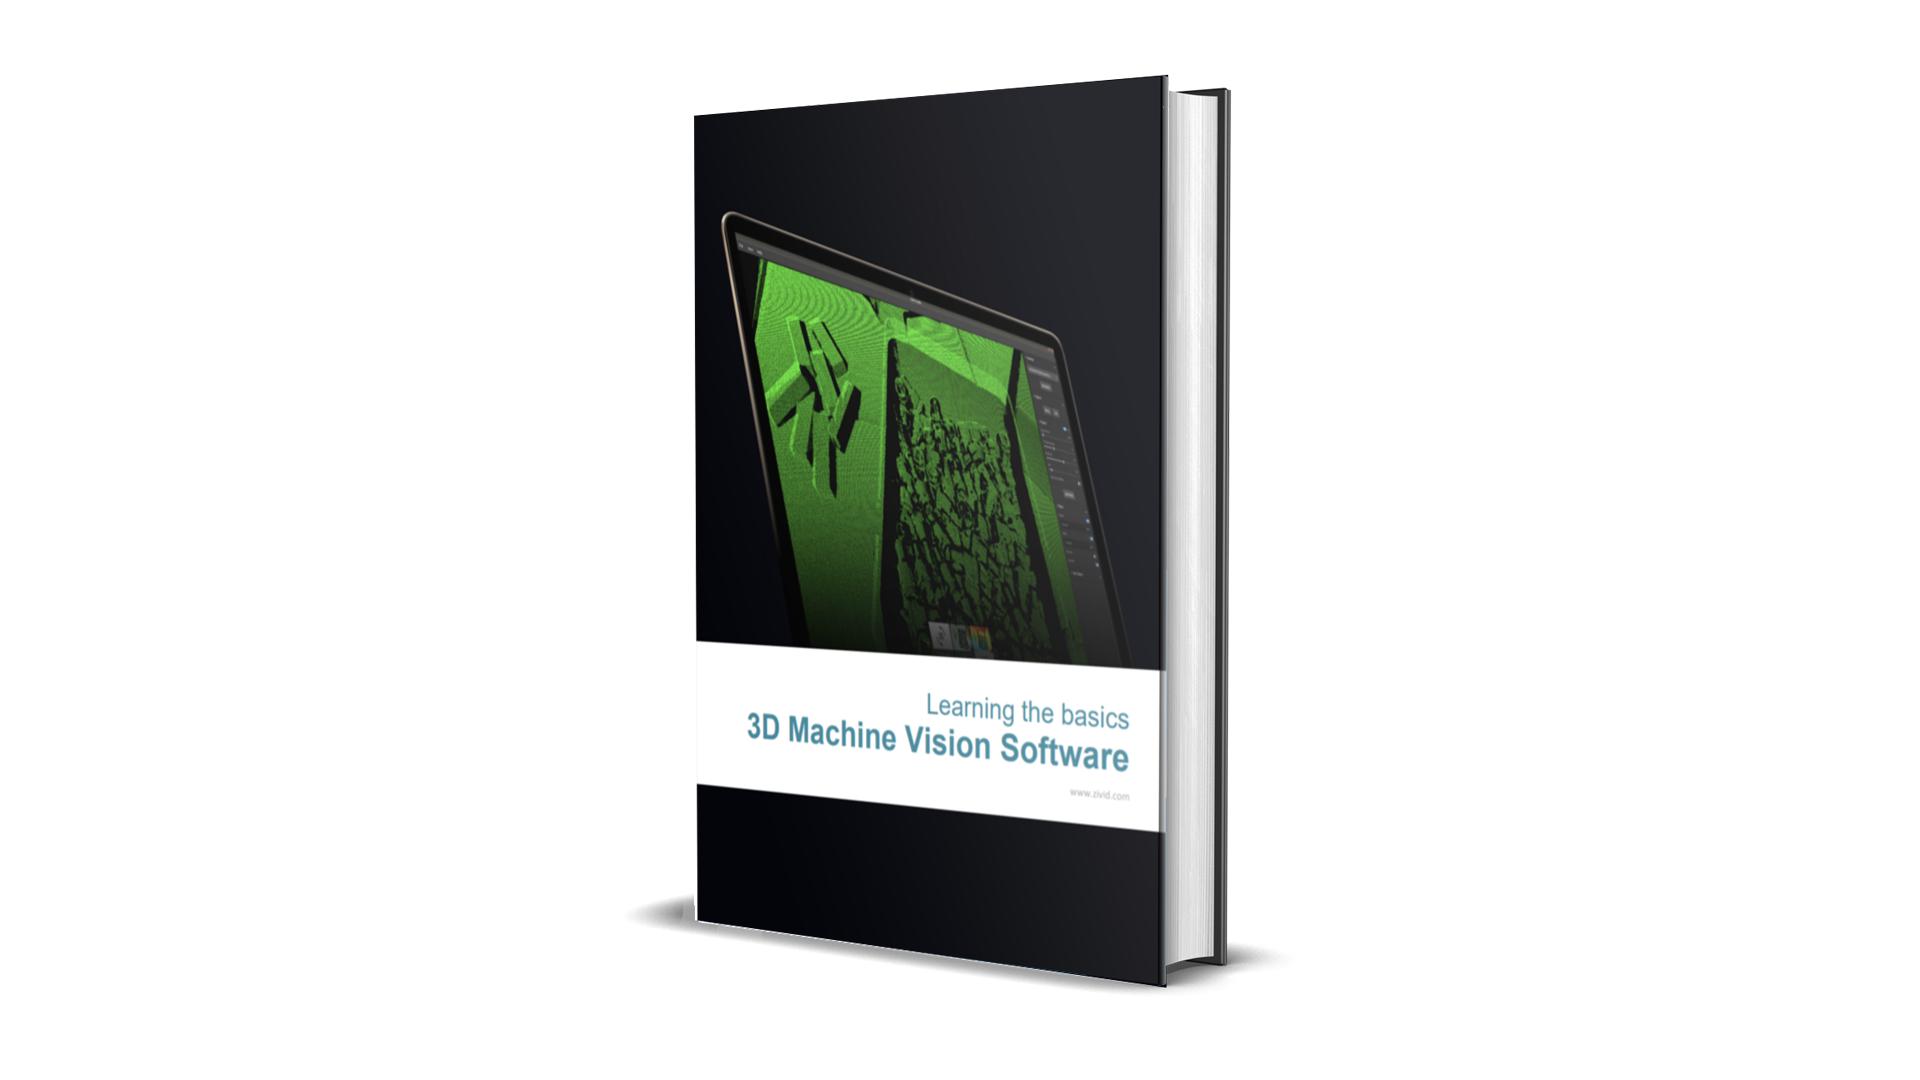 3d machine vision software ebook